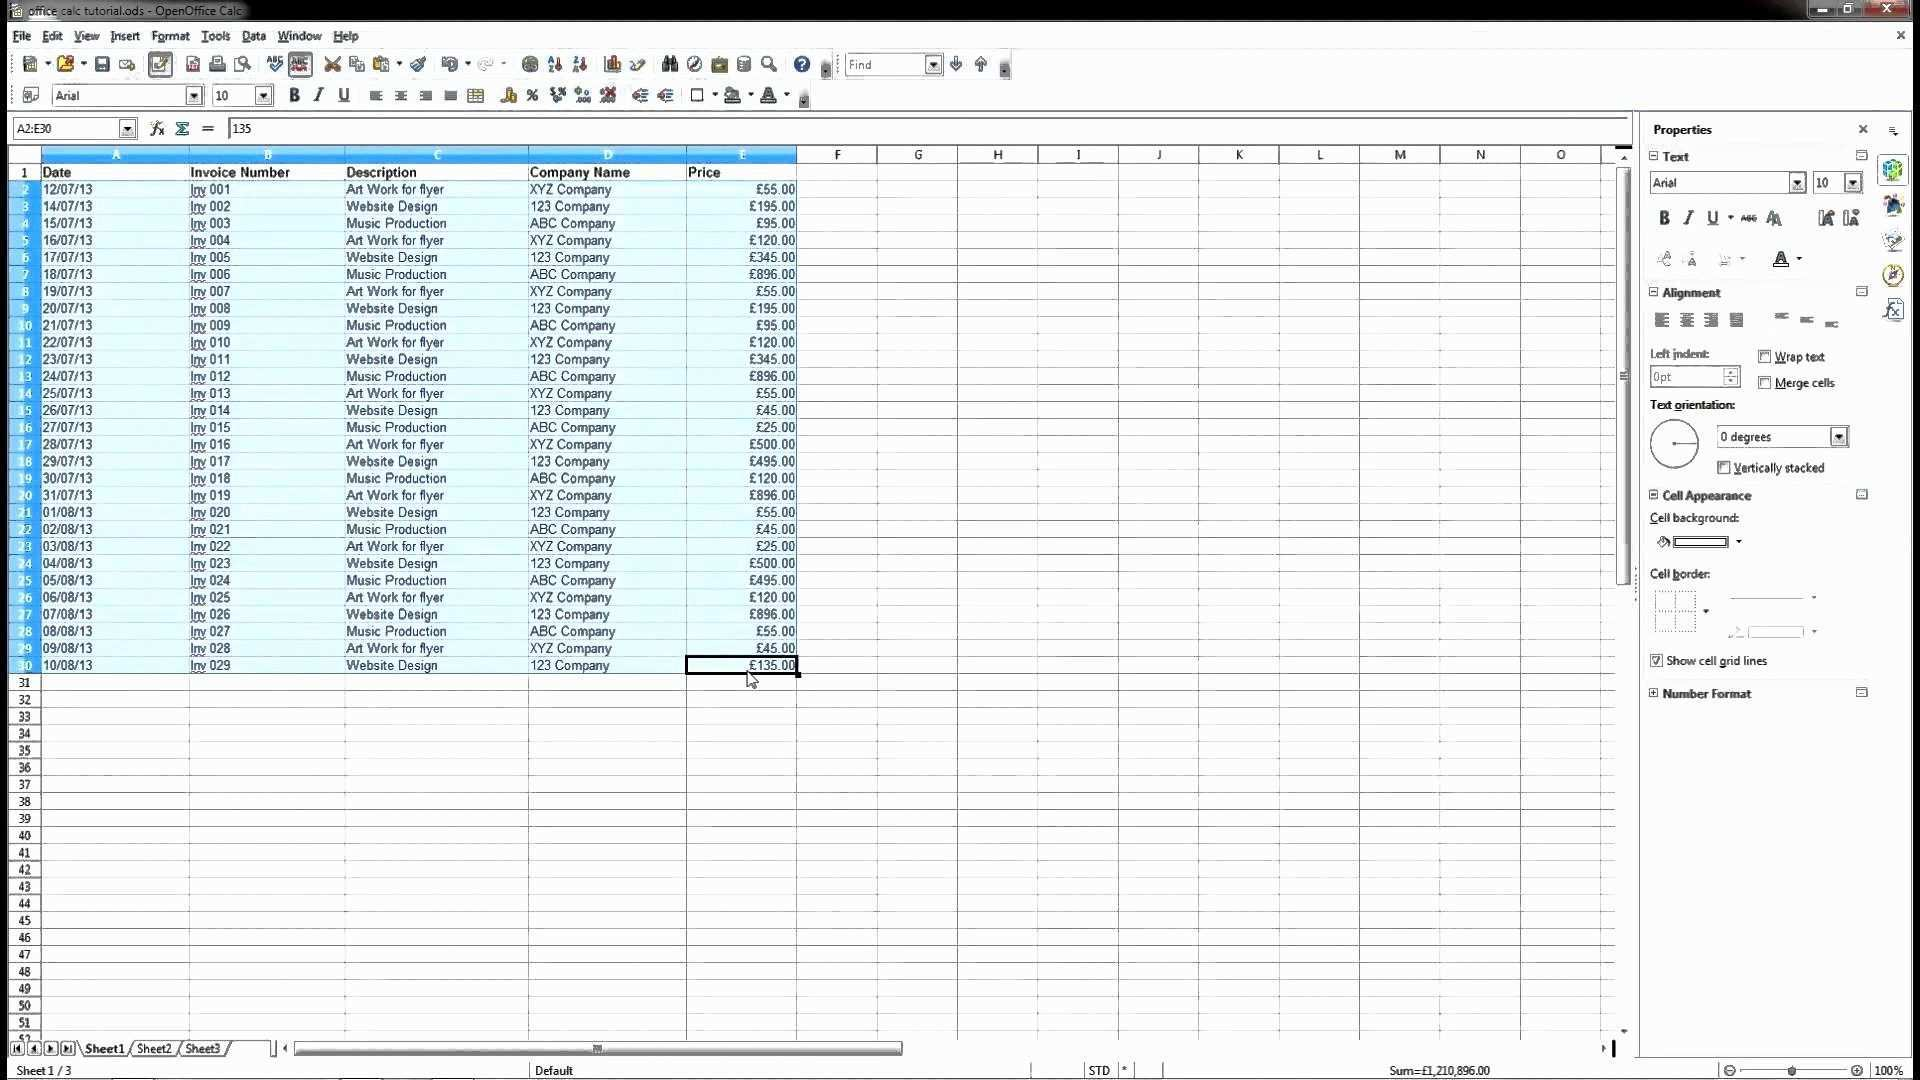 029 Free Fleet Management Spreadsheet Excel Truck Download Pertaining To Fleet Management R In 2020 Spreadsheet Template Excel Spreadsheets Templates Business Template